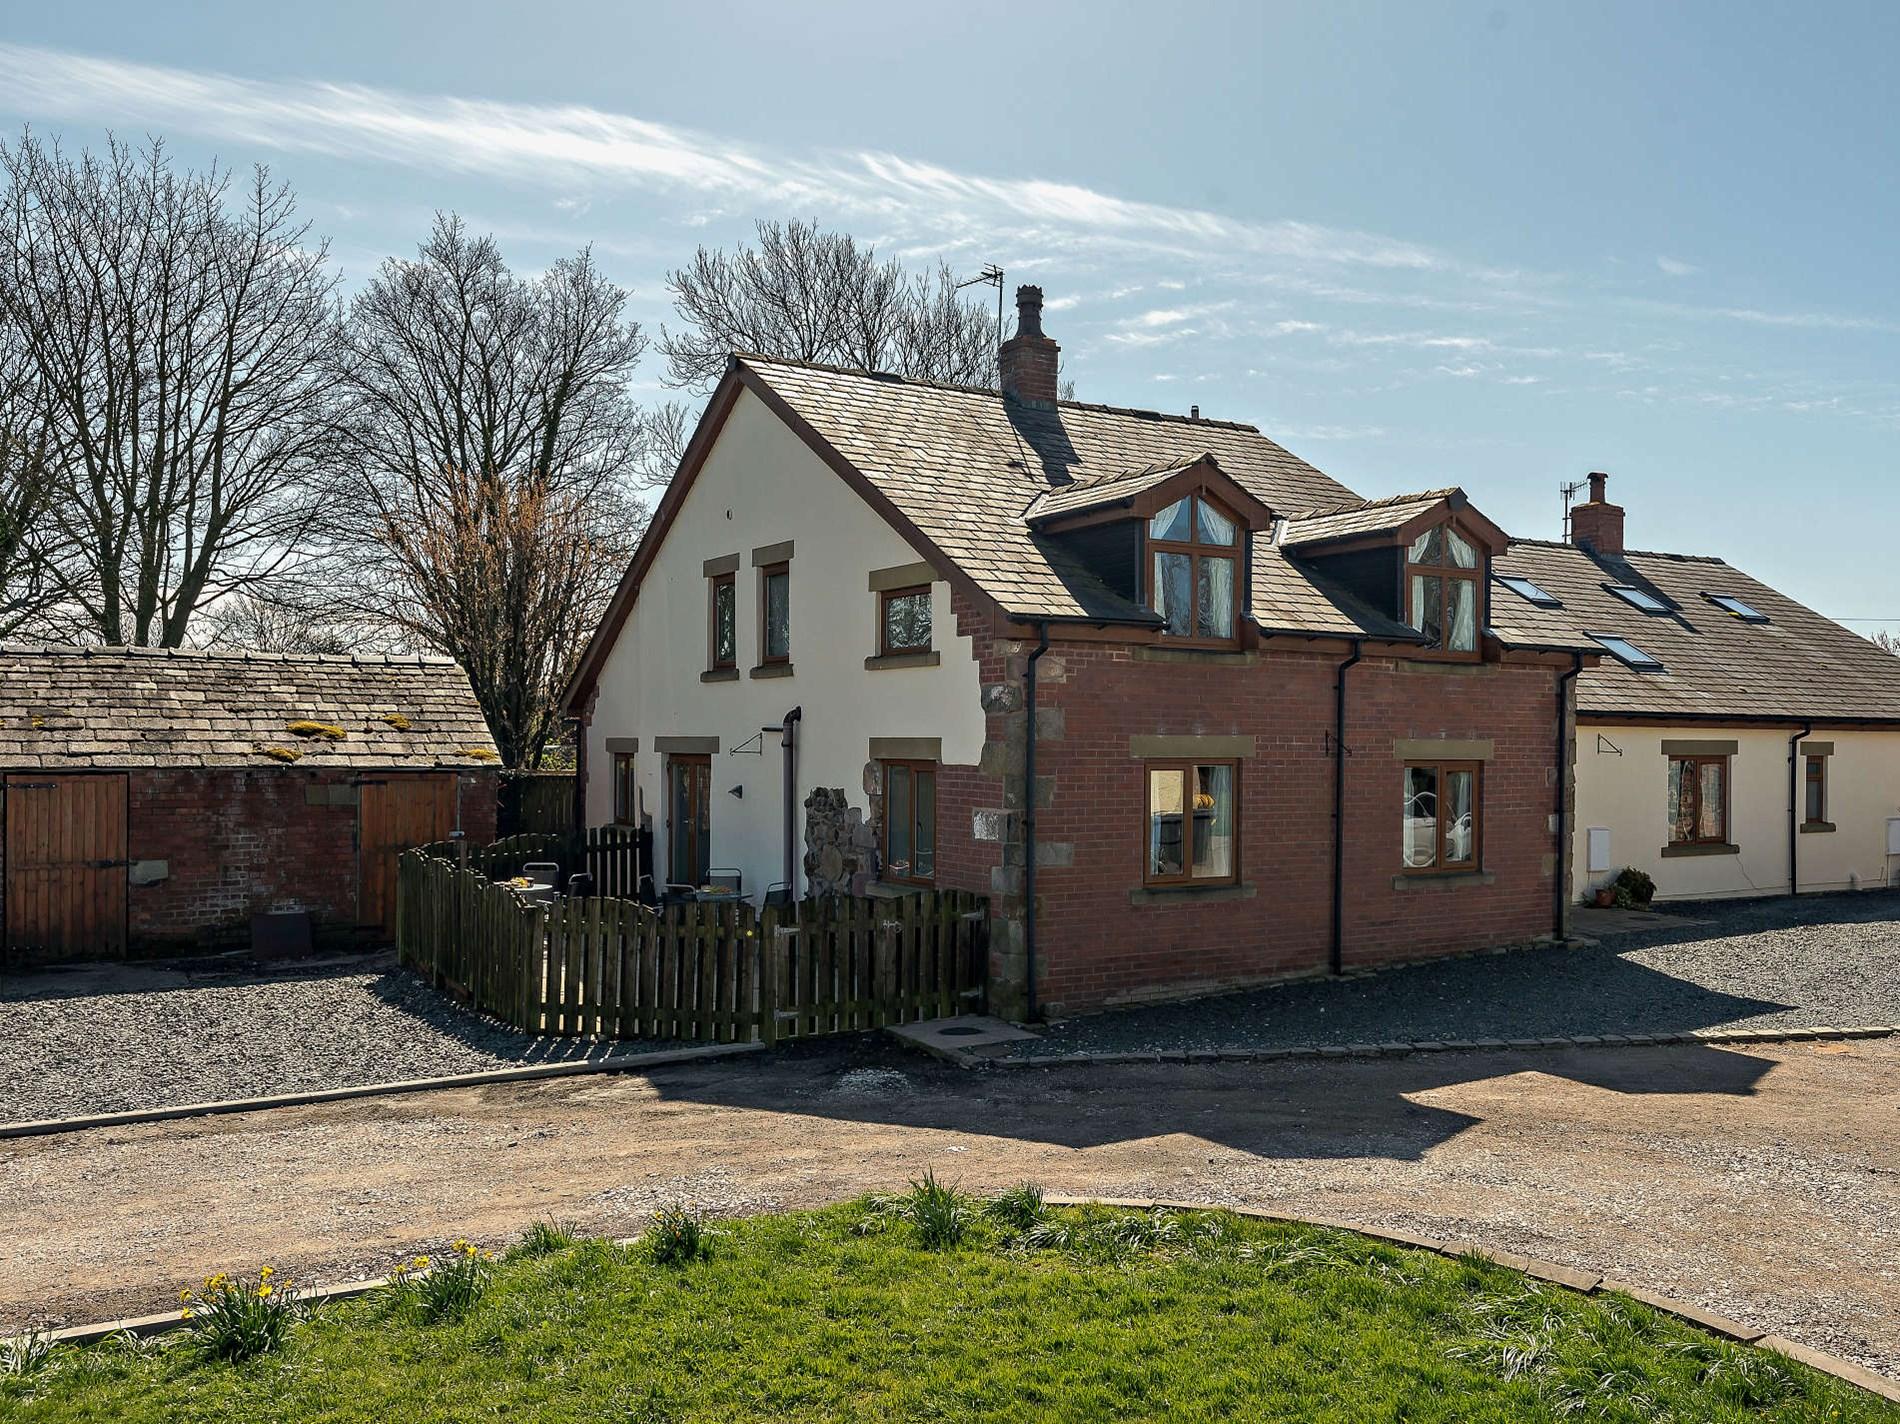 5 Bedroom Cottage in Preston, Yorkshire Dales